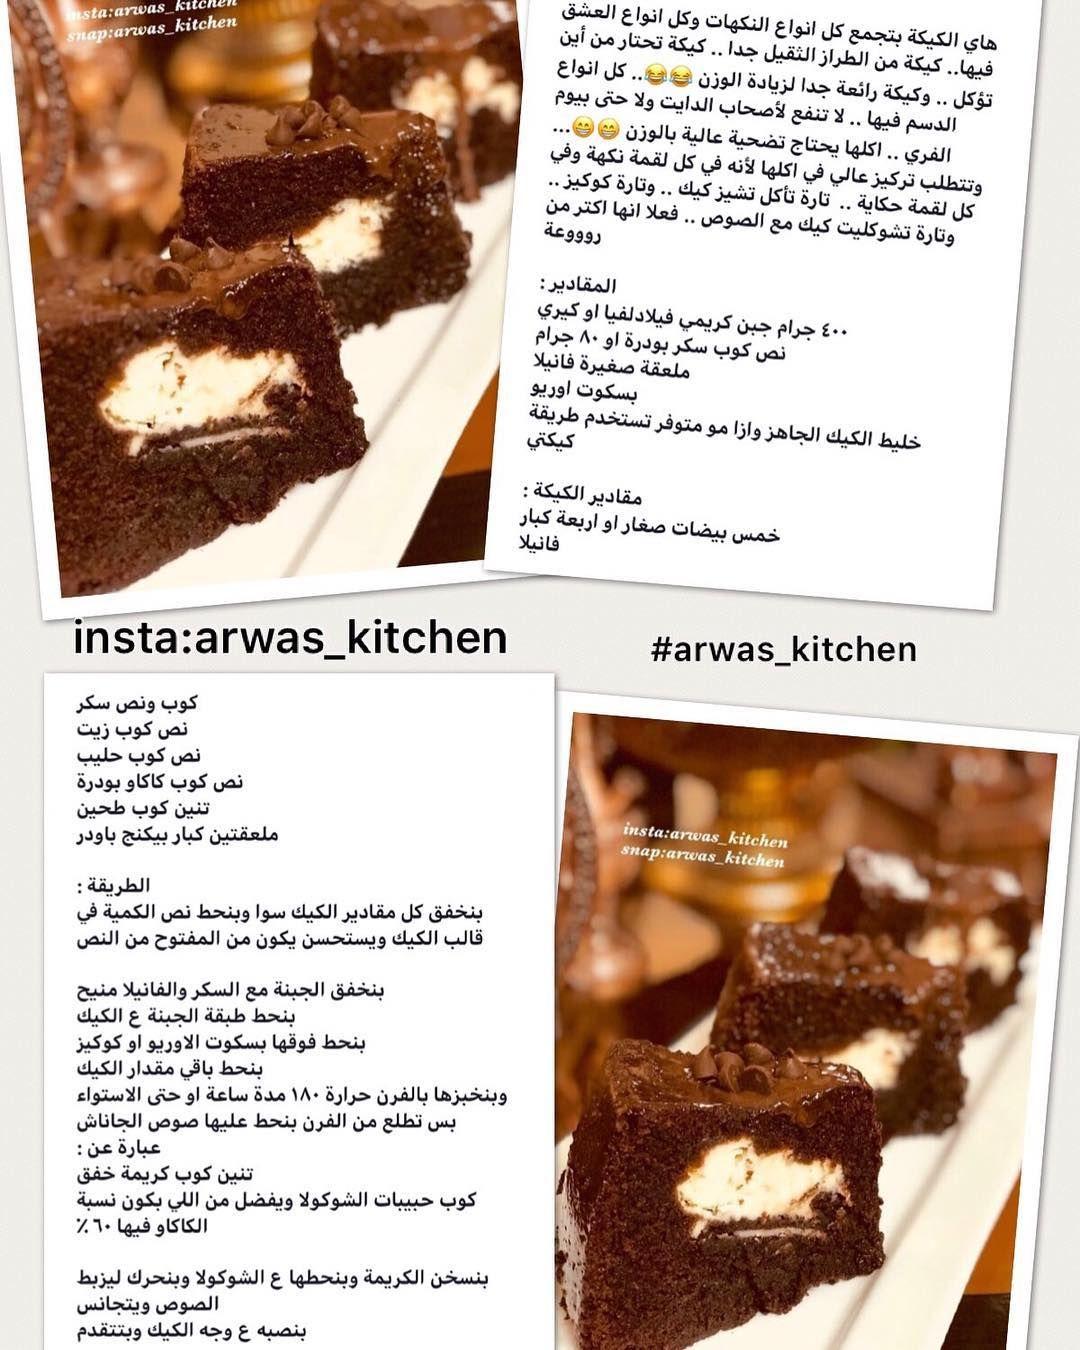 Arwa Ghazi On Instagram Arwas Kitchen Arwa اروى أروى عشاء غداء مساء الخير مساء النور مساء وجبة الرياض الاردن الأردن أطباق Yummy Food Food Yummy